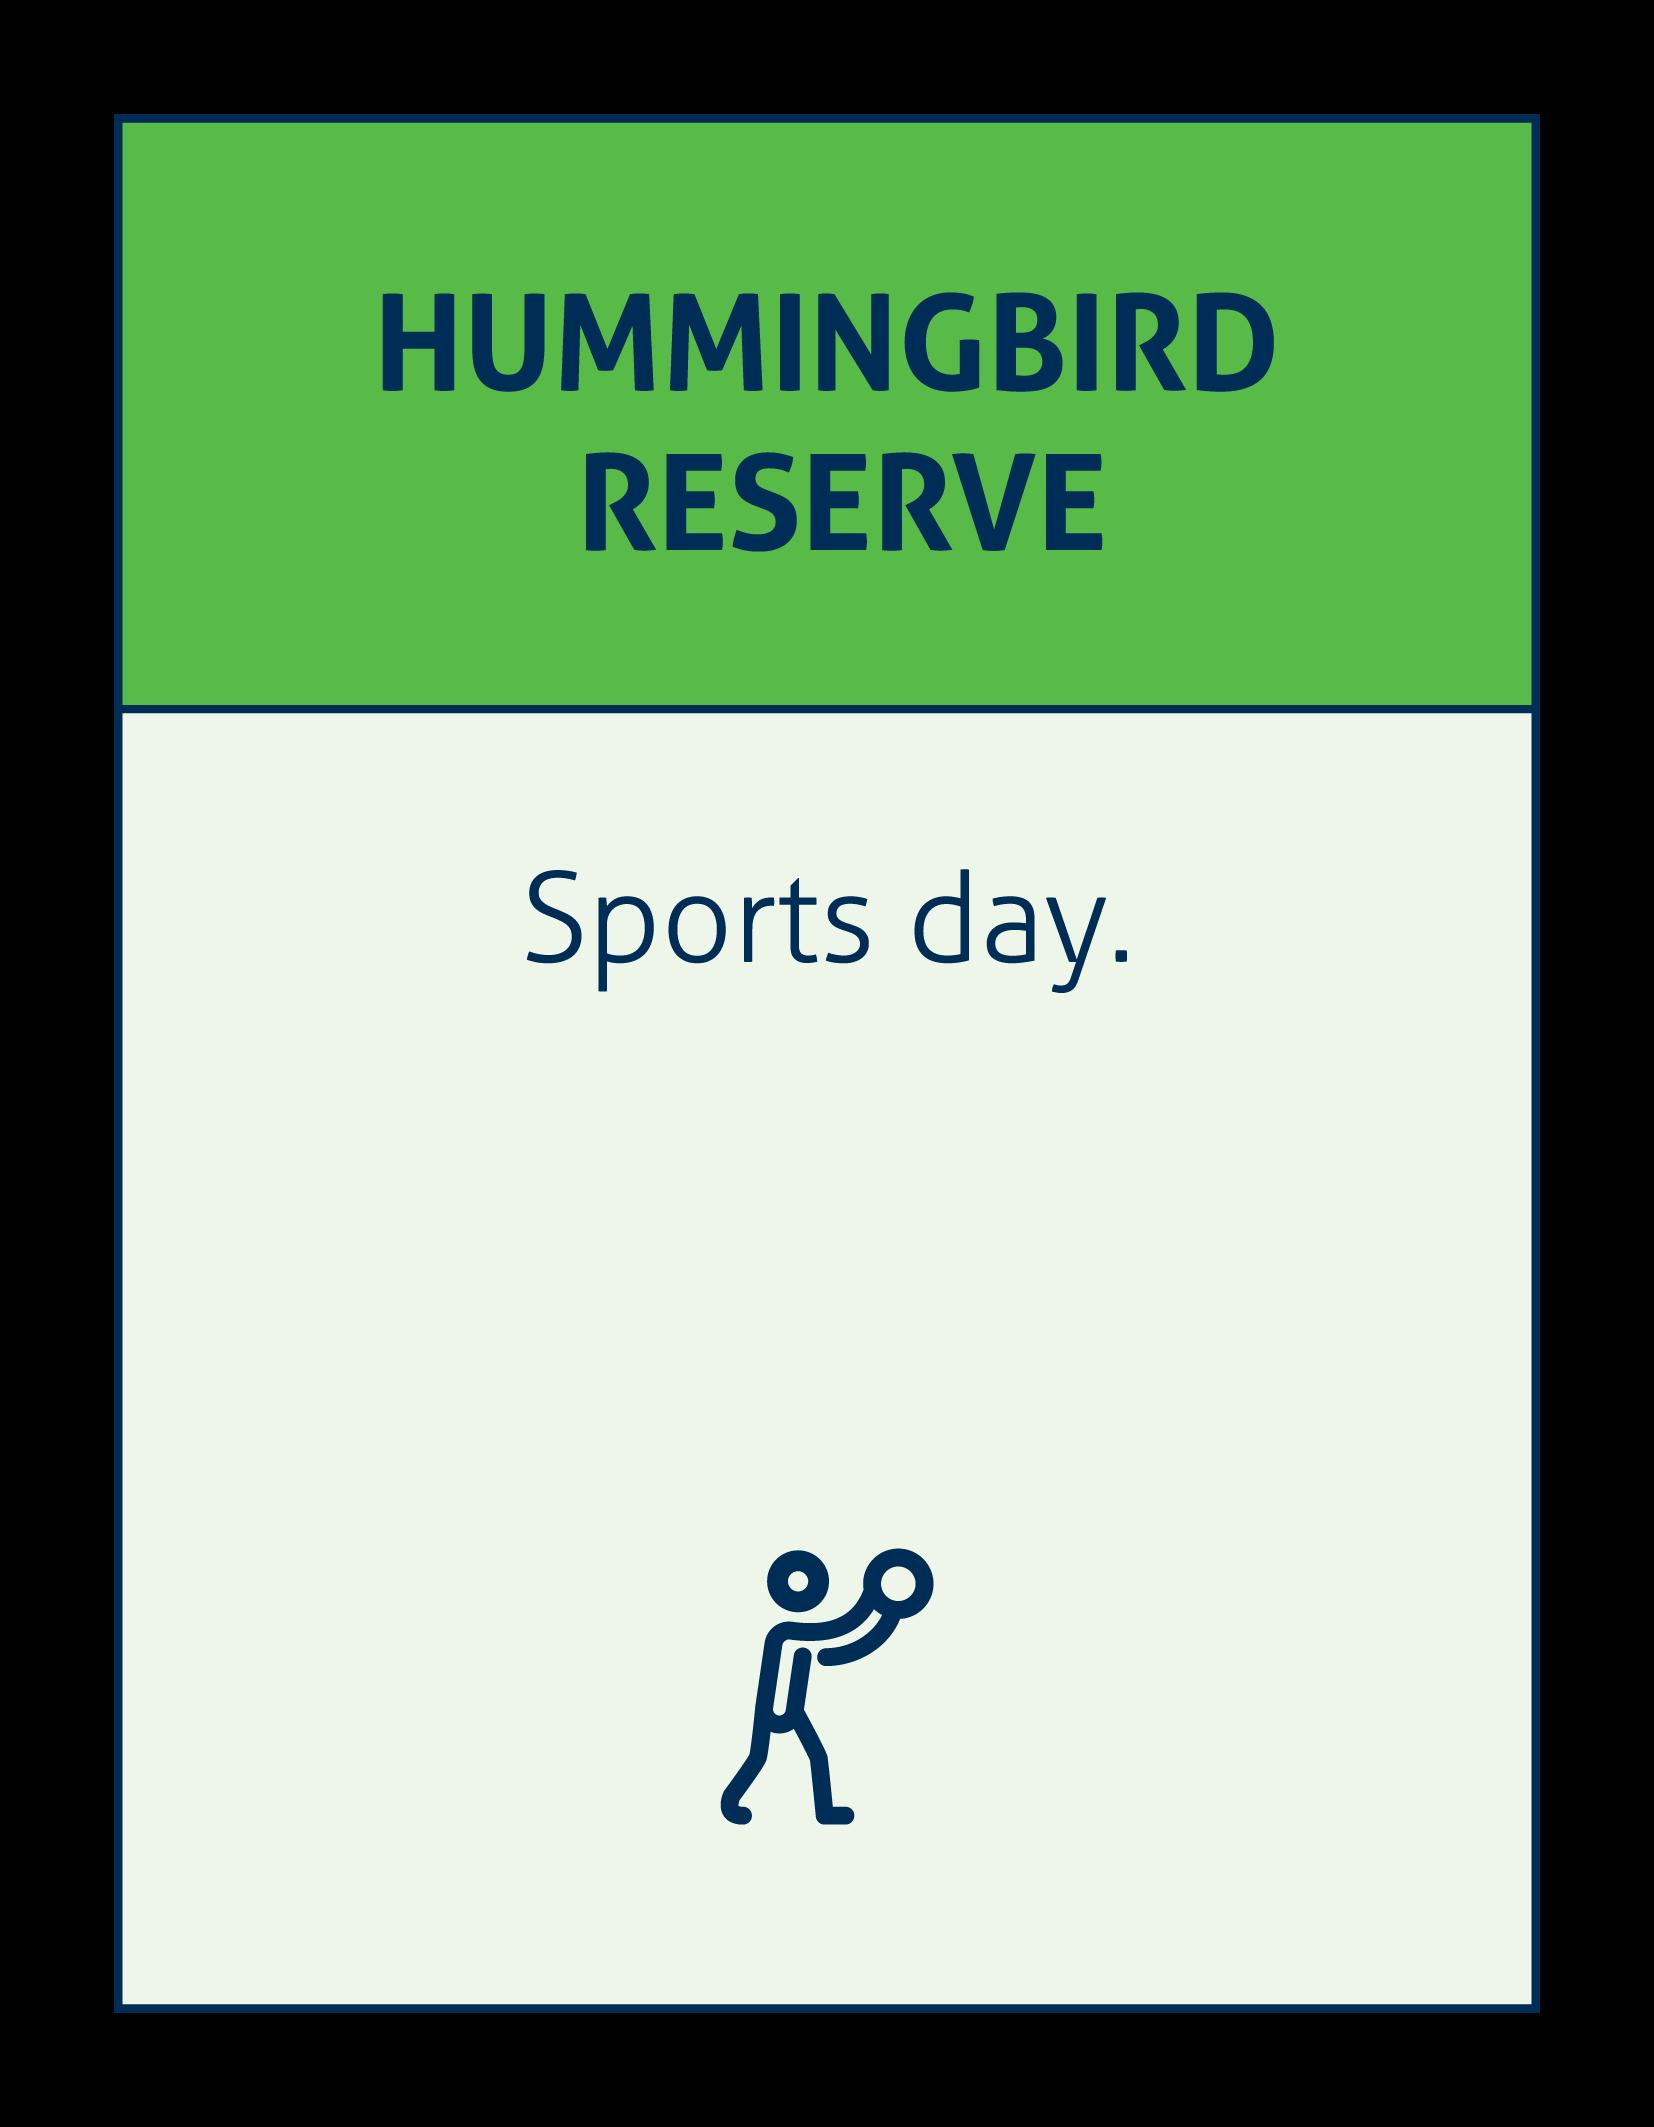 WLS0081_WynaOpoly_Board_IndividualSquares_v1_HummingBird_Reserve[1]